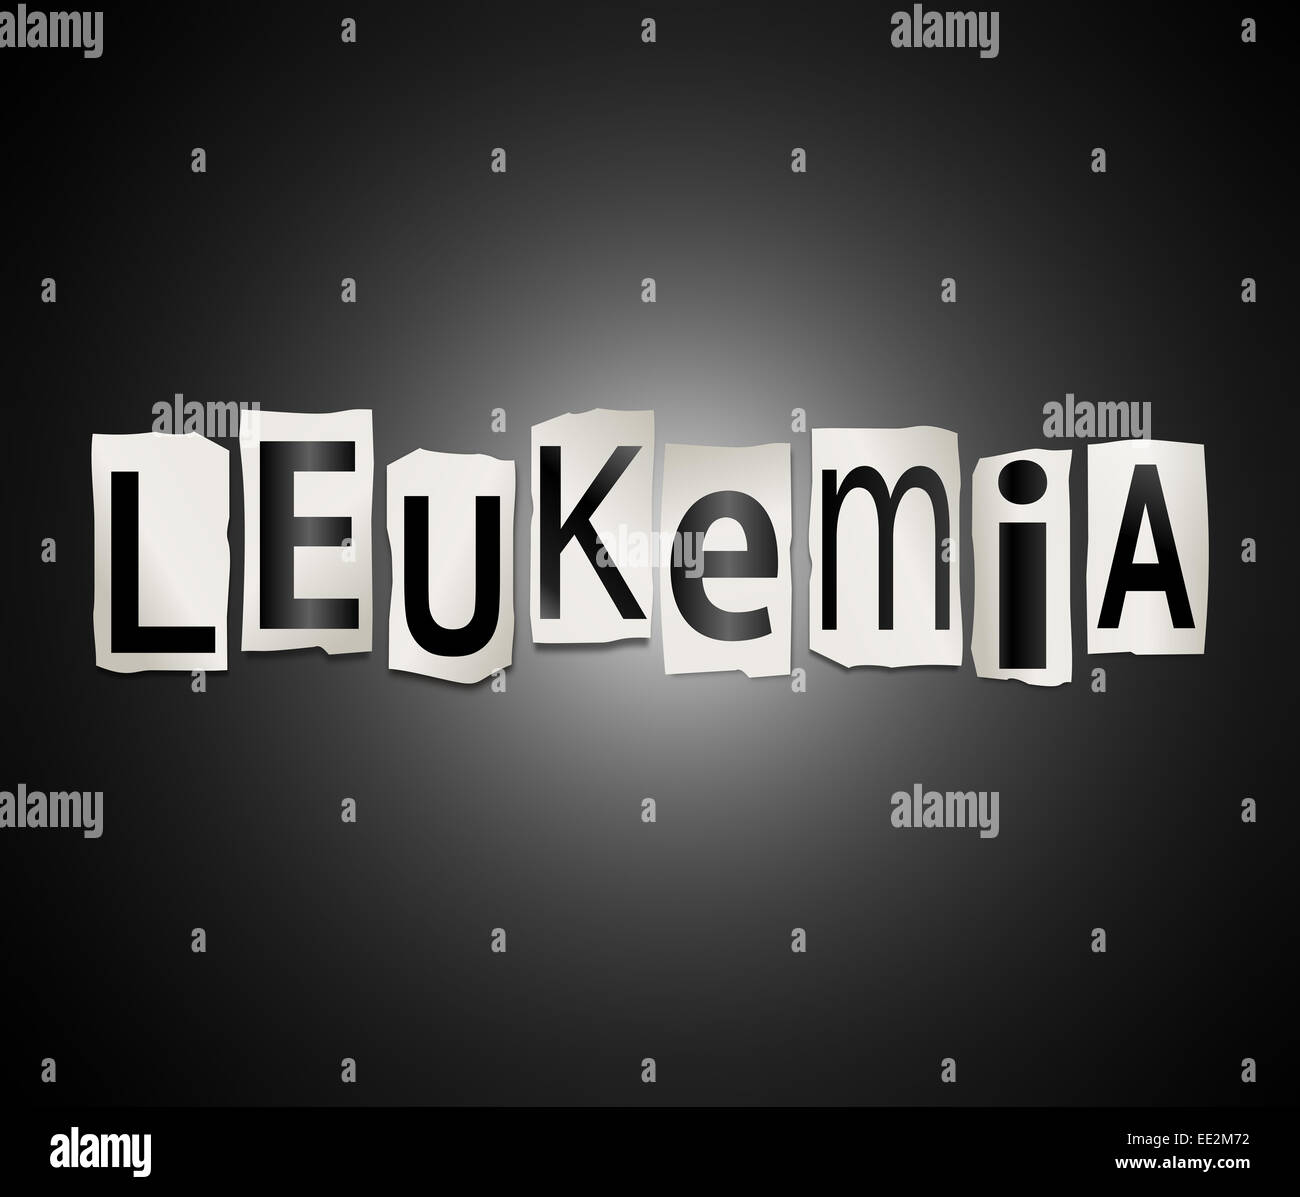 Leukemia. - Stock Image